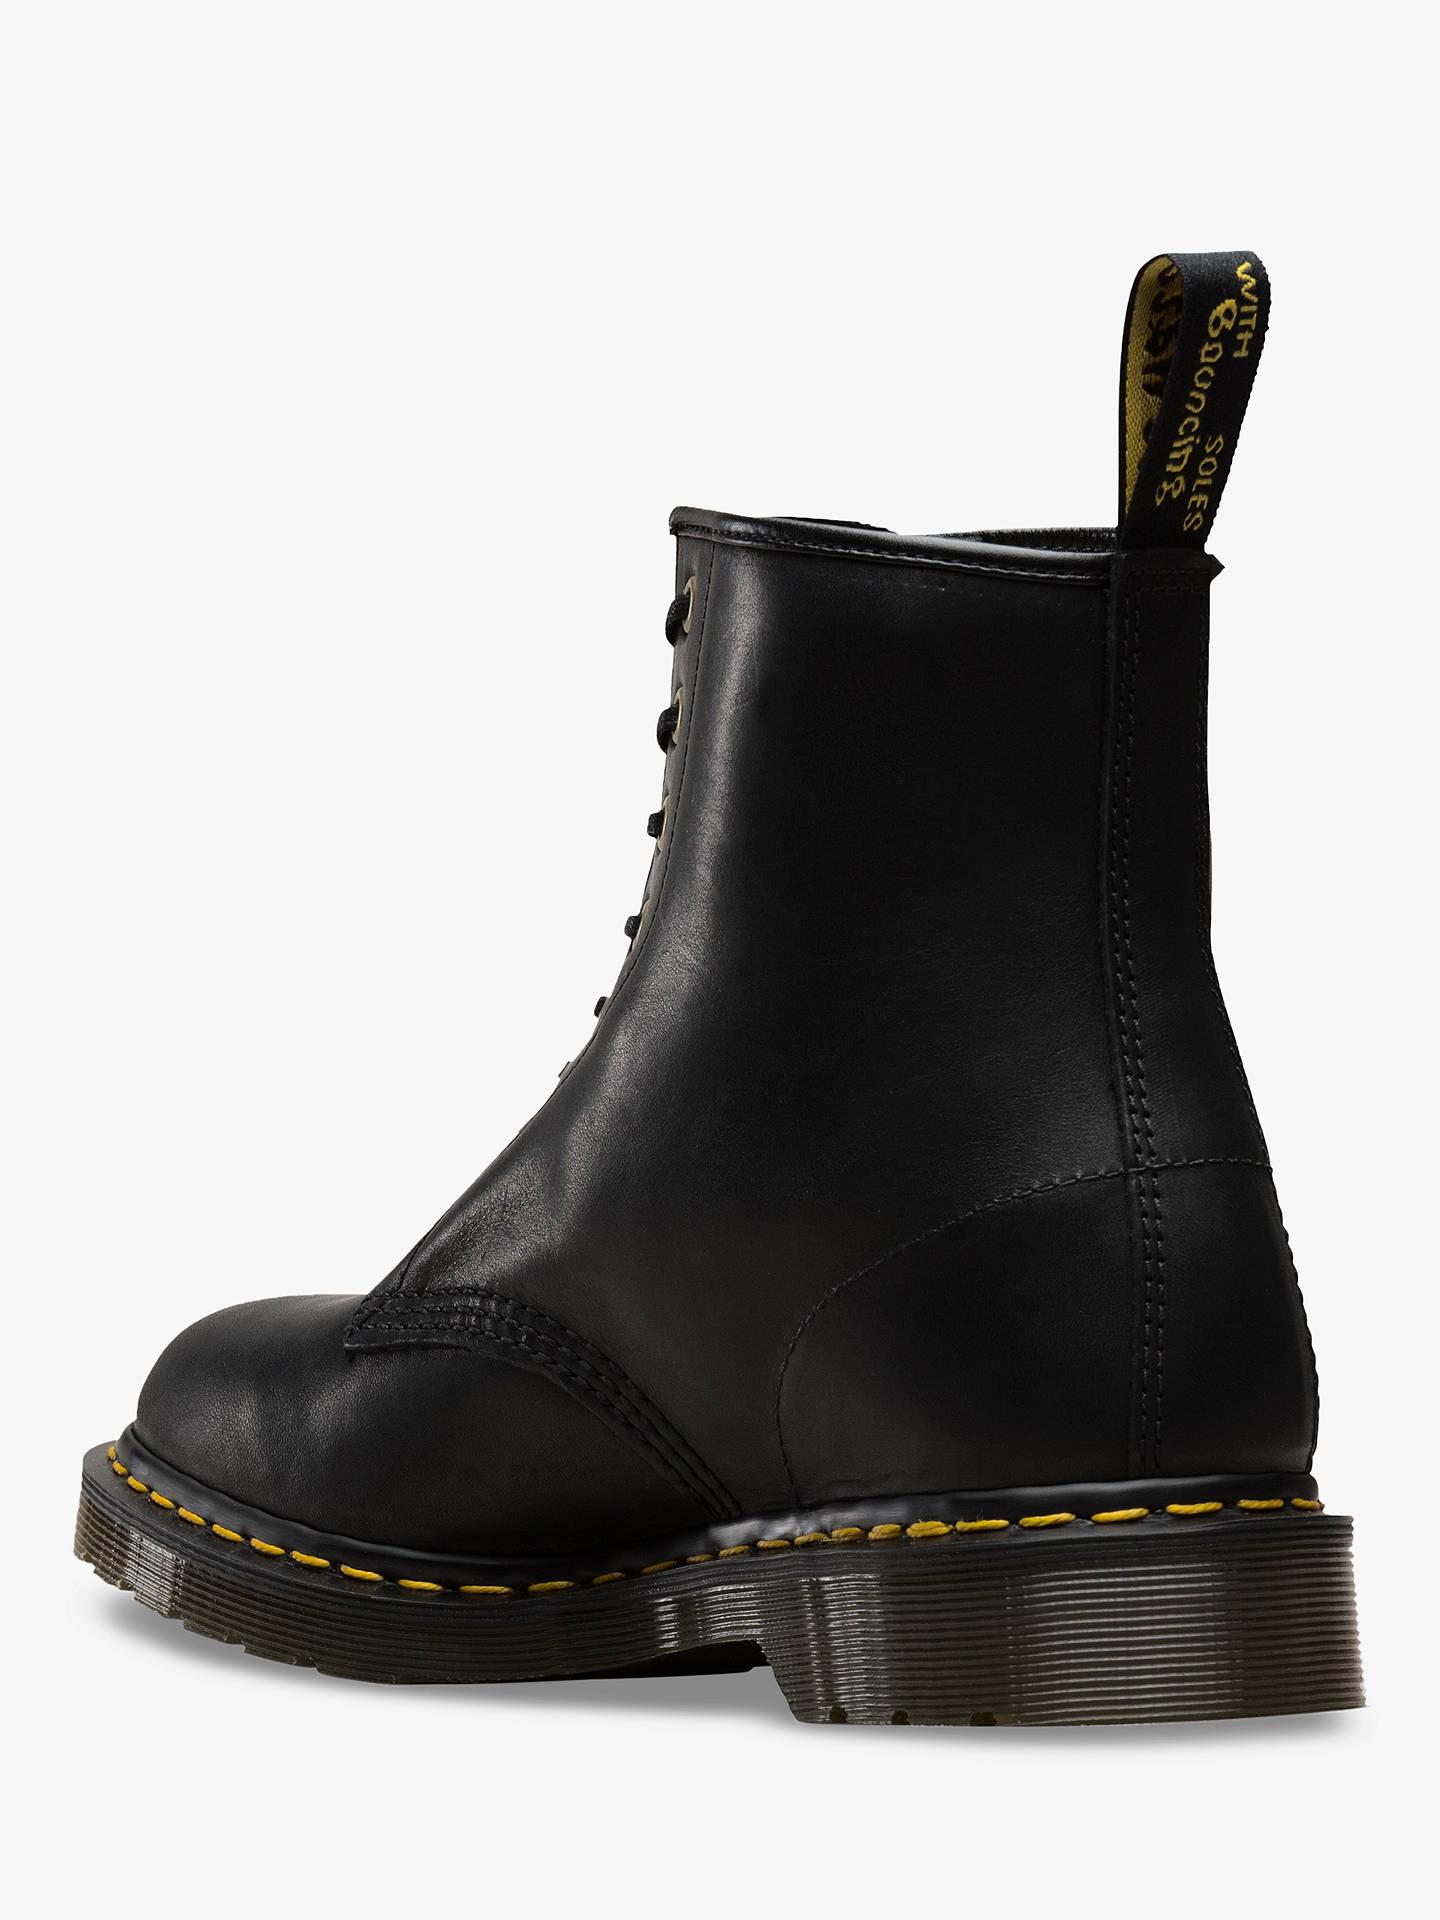 Dr Martens 1460 Dublin Boots, Black at